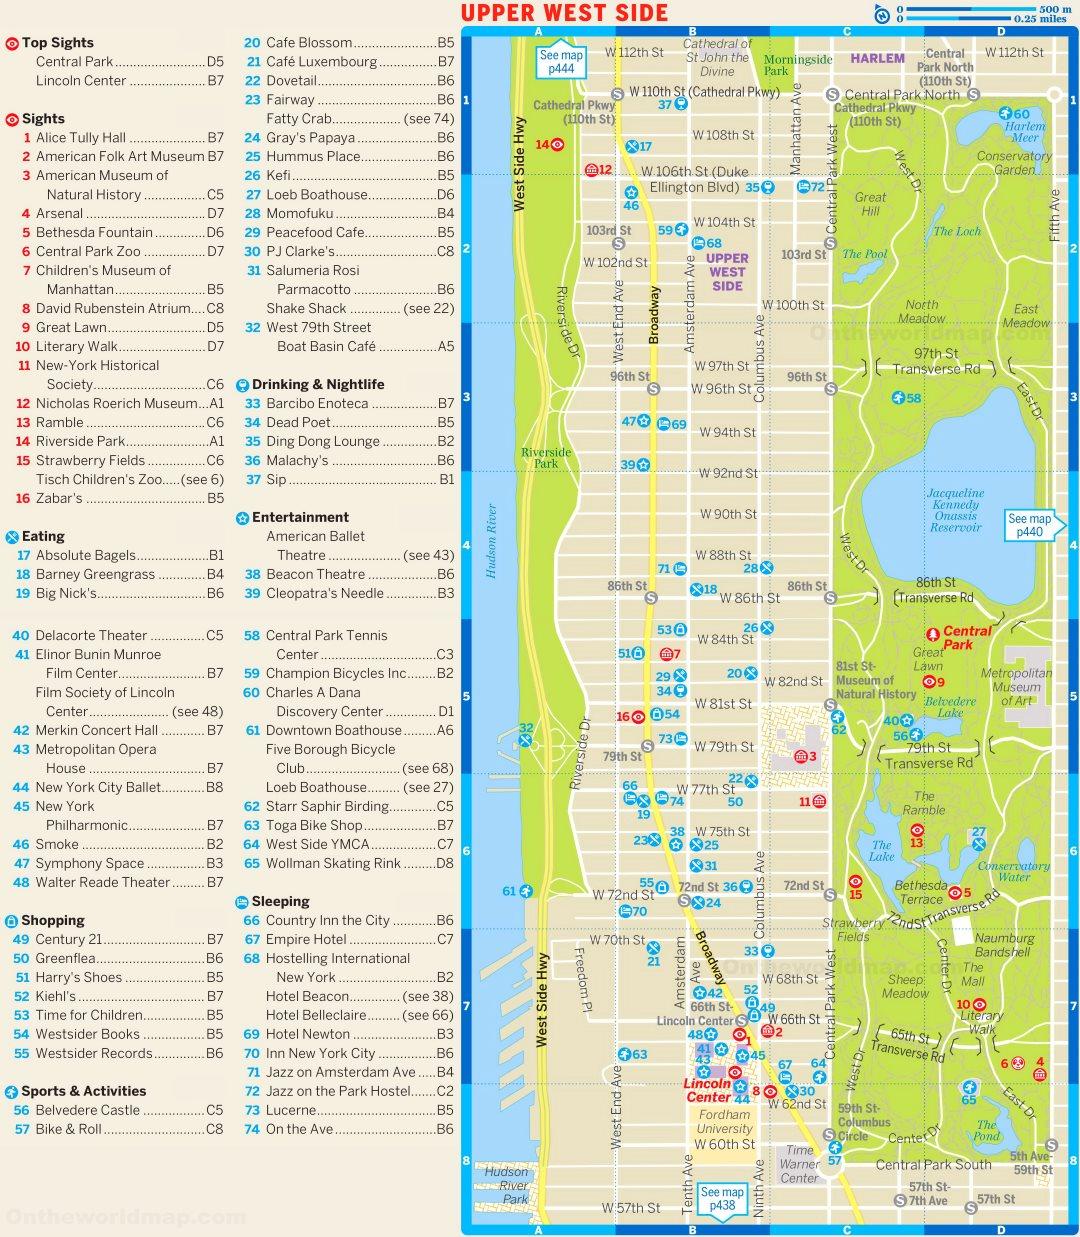 upper west side new york map Upper West Side Tourist Map